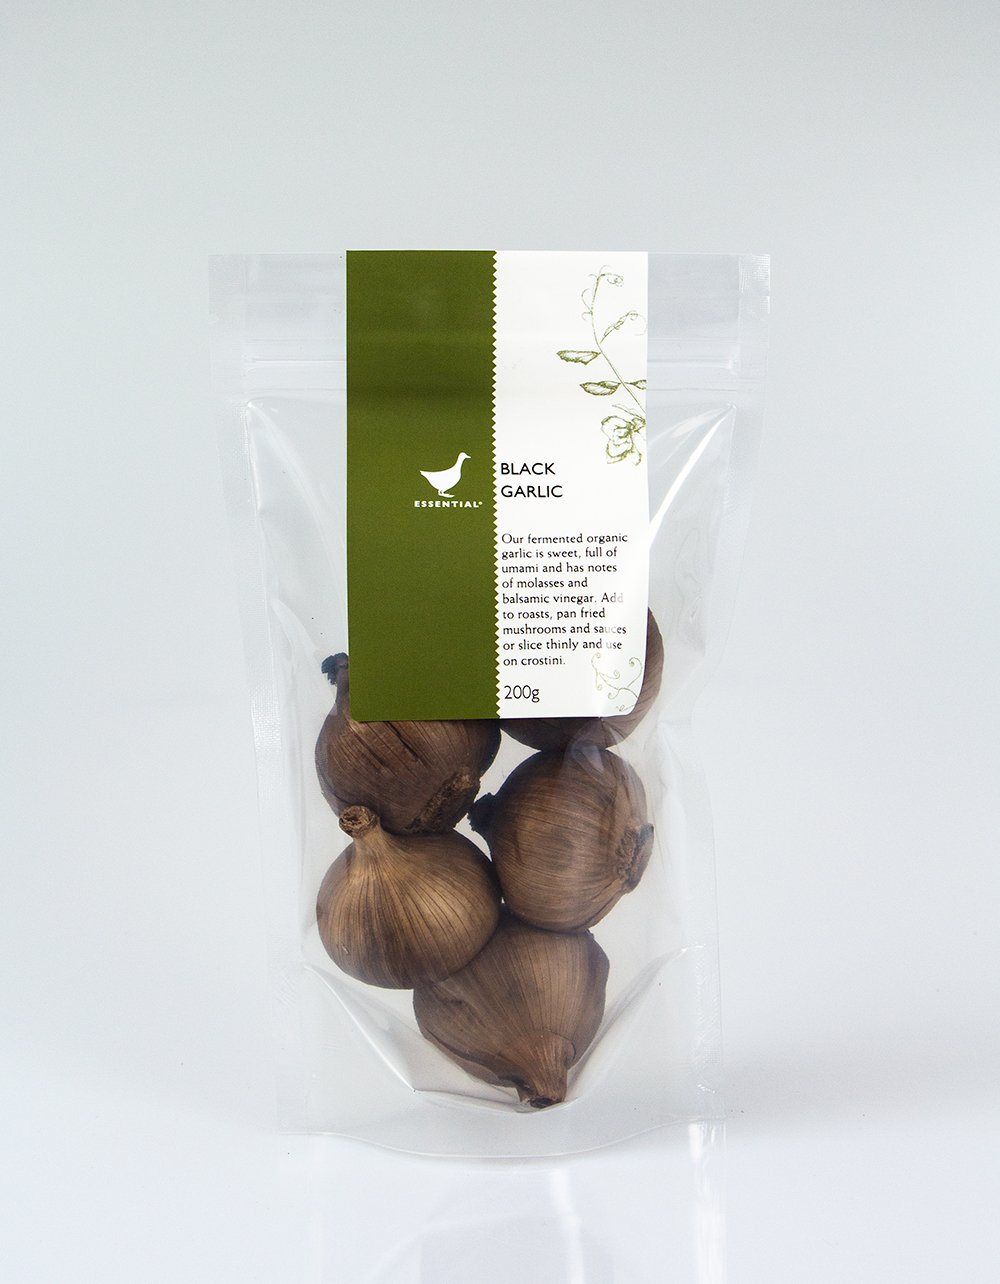 The Essential Ingredient Organic Black Garlic 200g